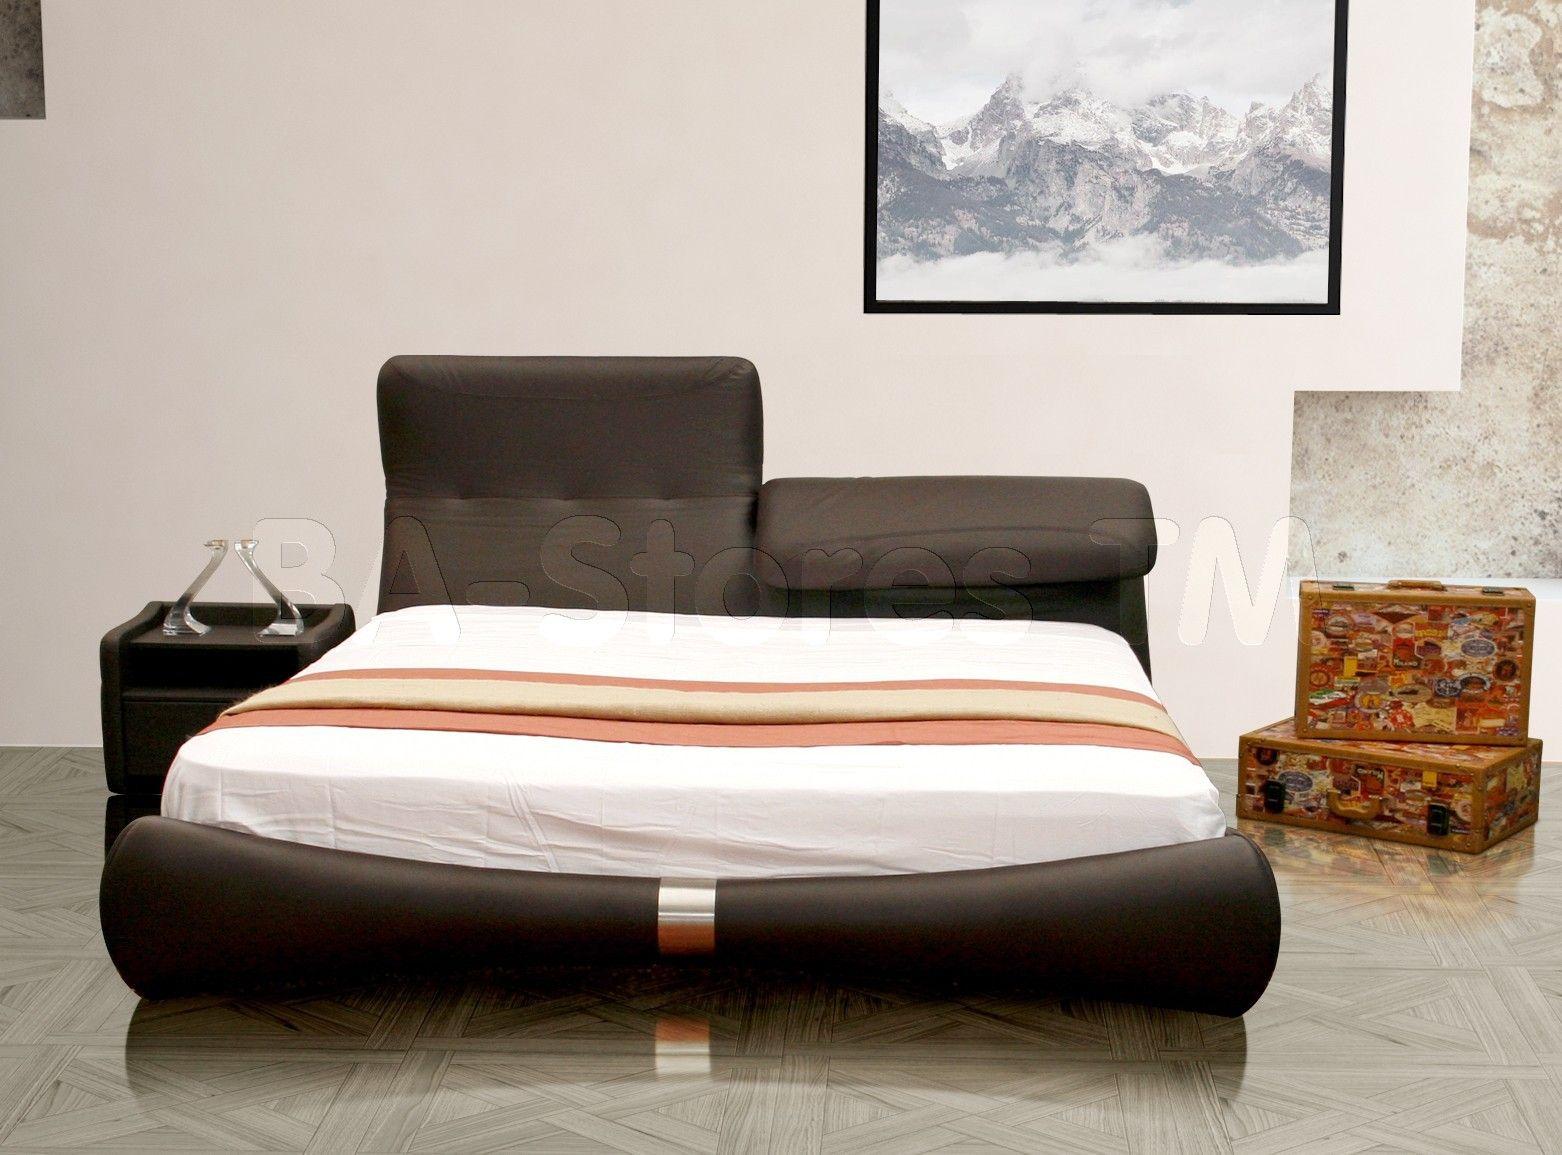 adjustable headboard platform beds | Luxe King Platform Bed with ...